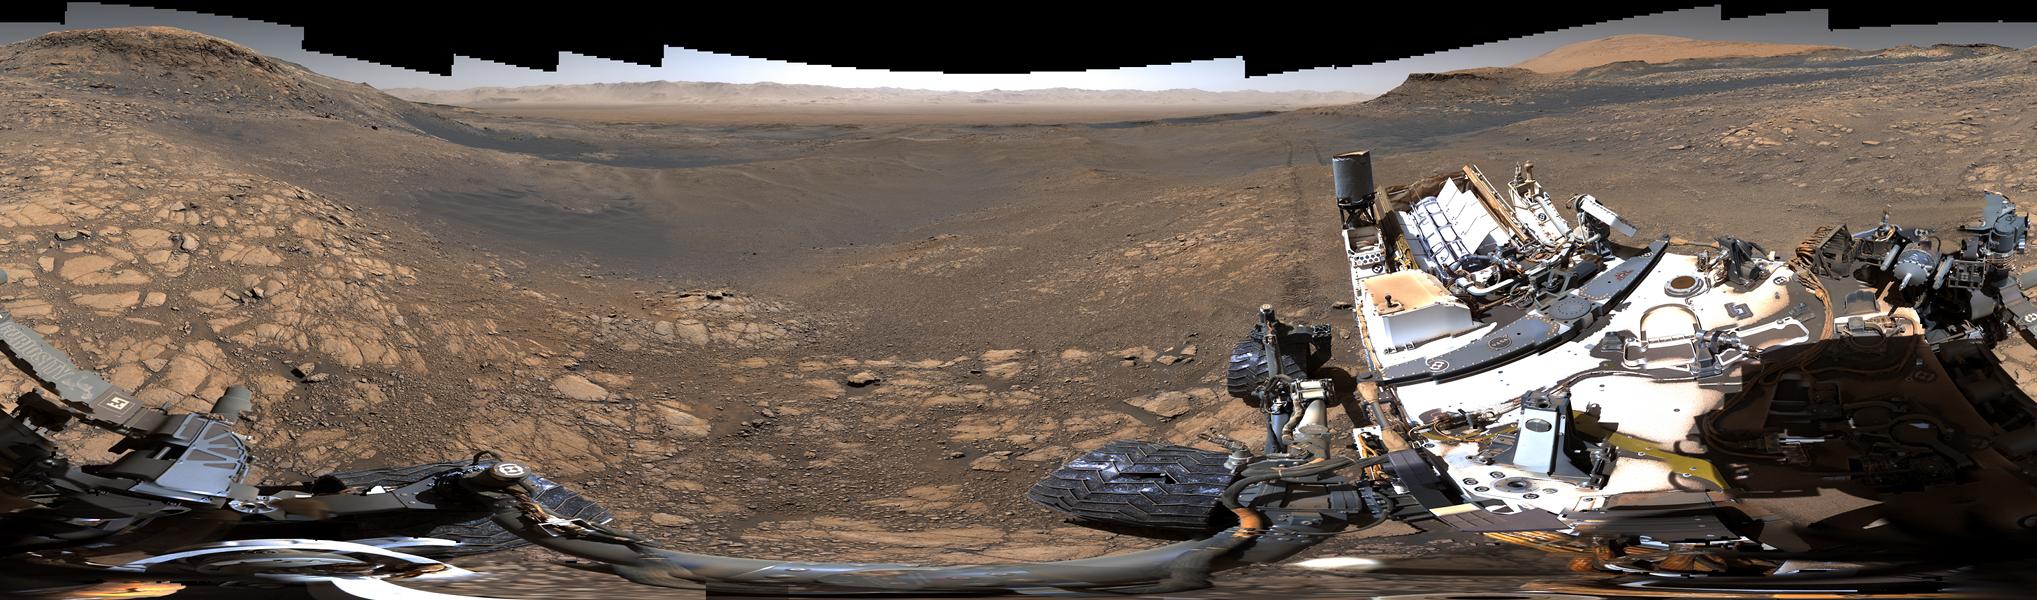 Panorama martien par Curiosity